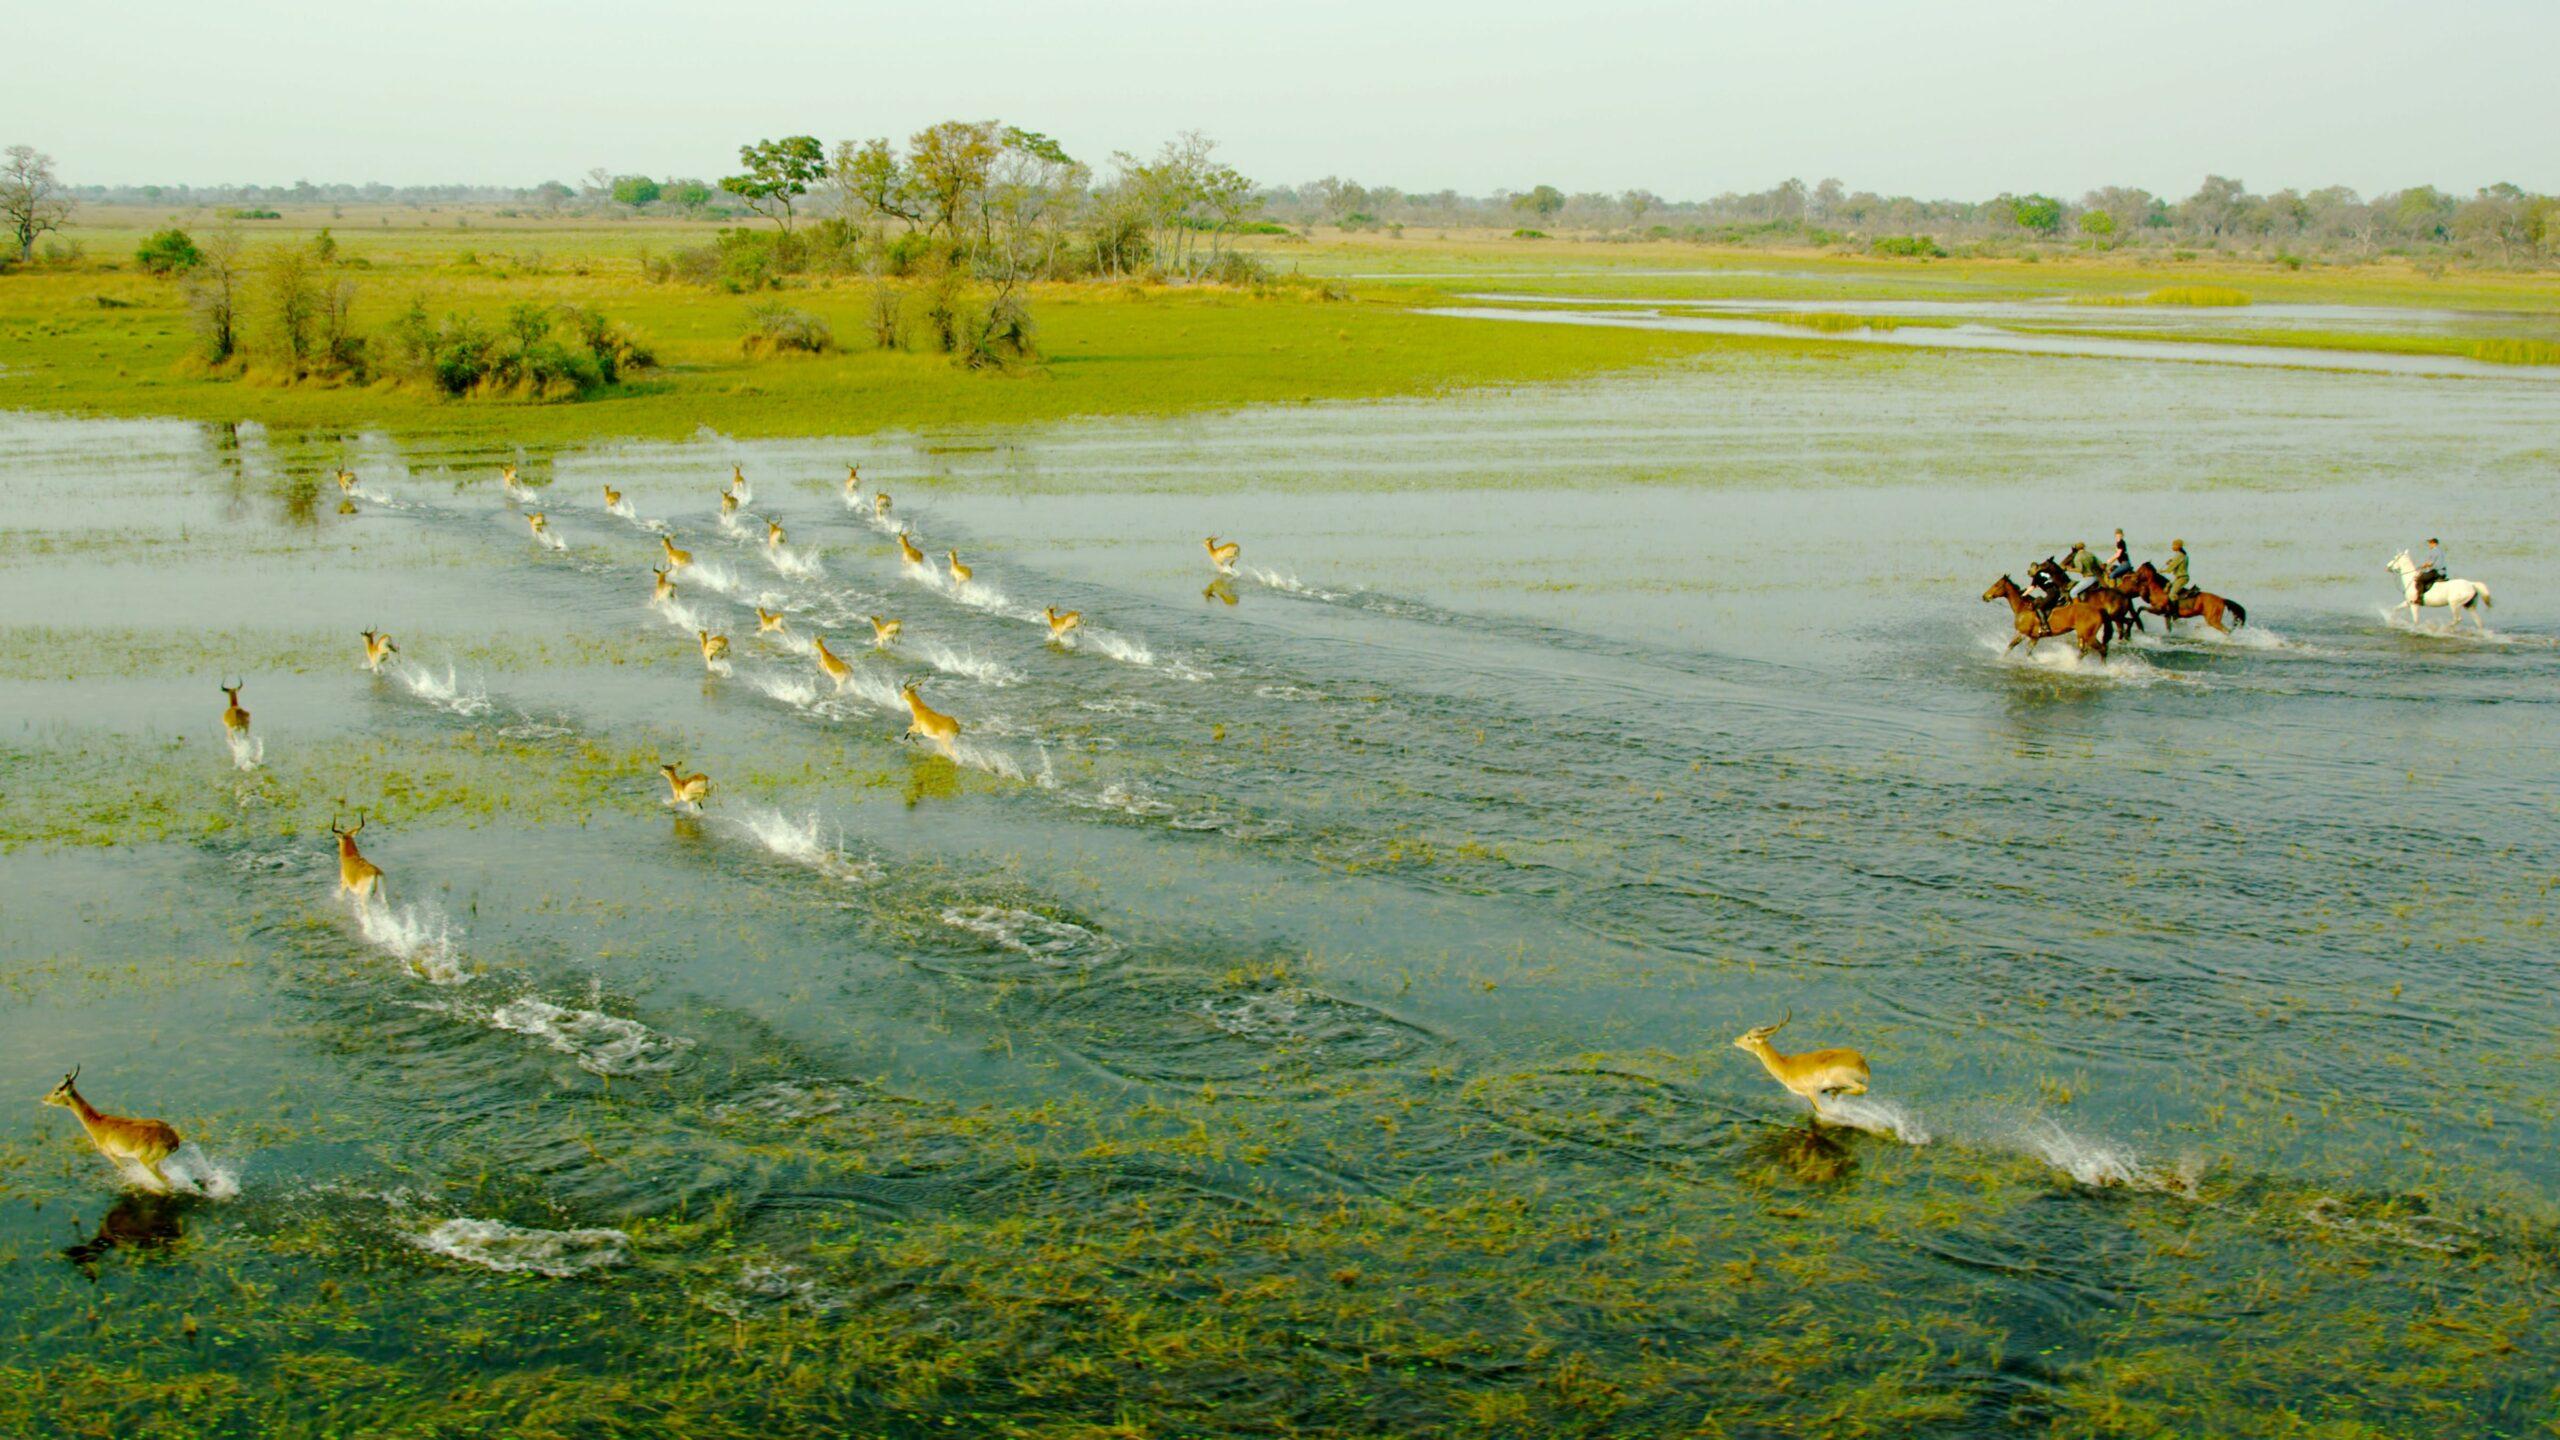 Safari te paard in Kujwana / Botswana - Vakantie te paard / Reisbureau Perlan